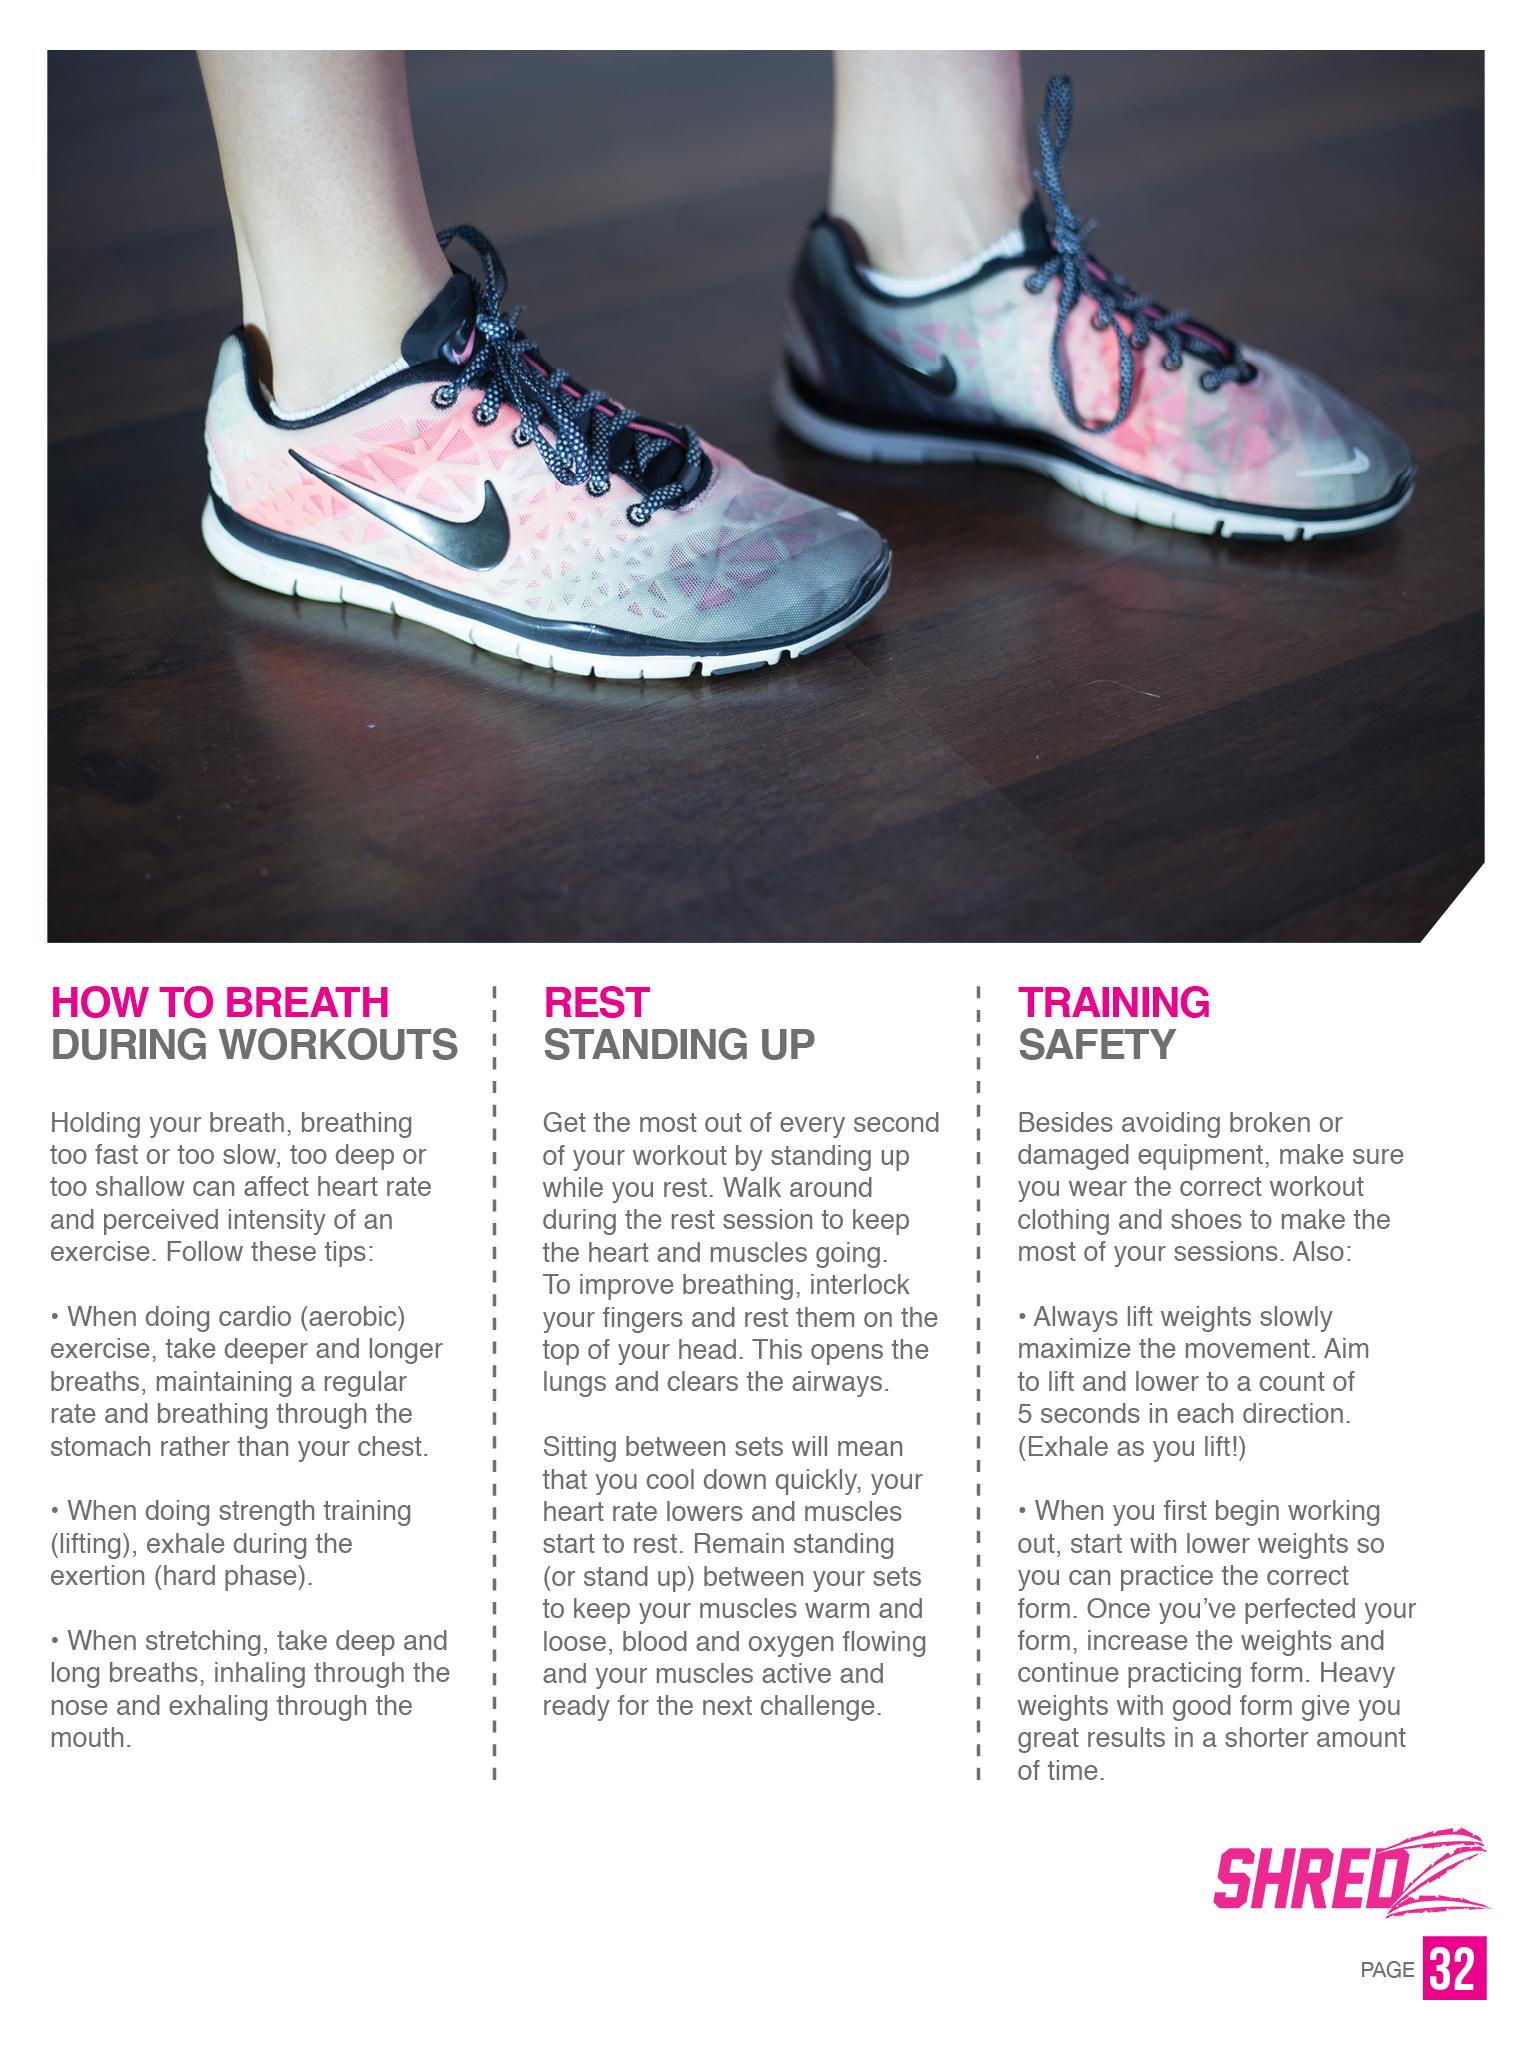 shredz home workout guide